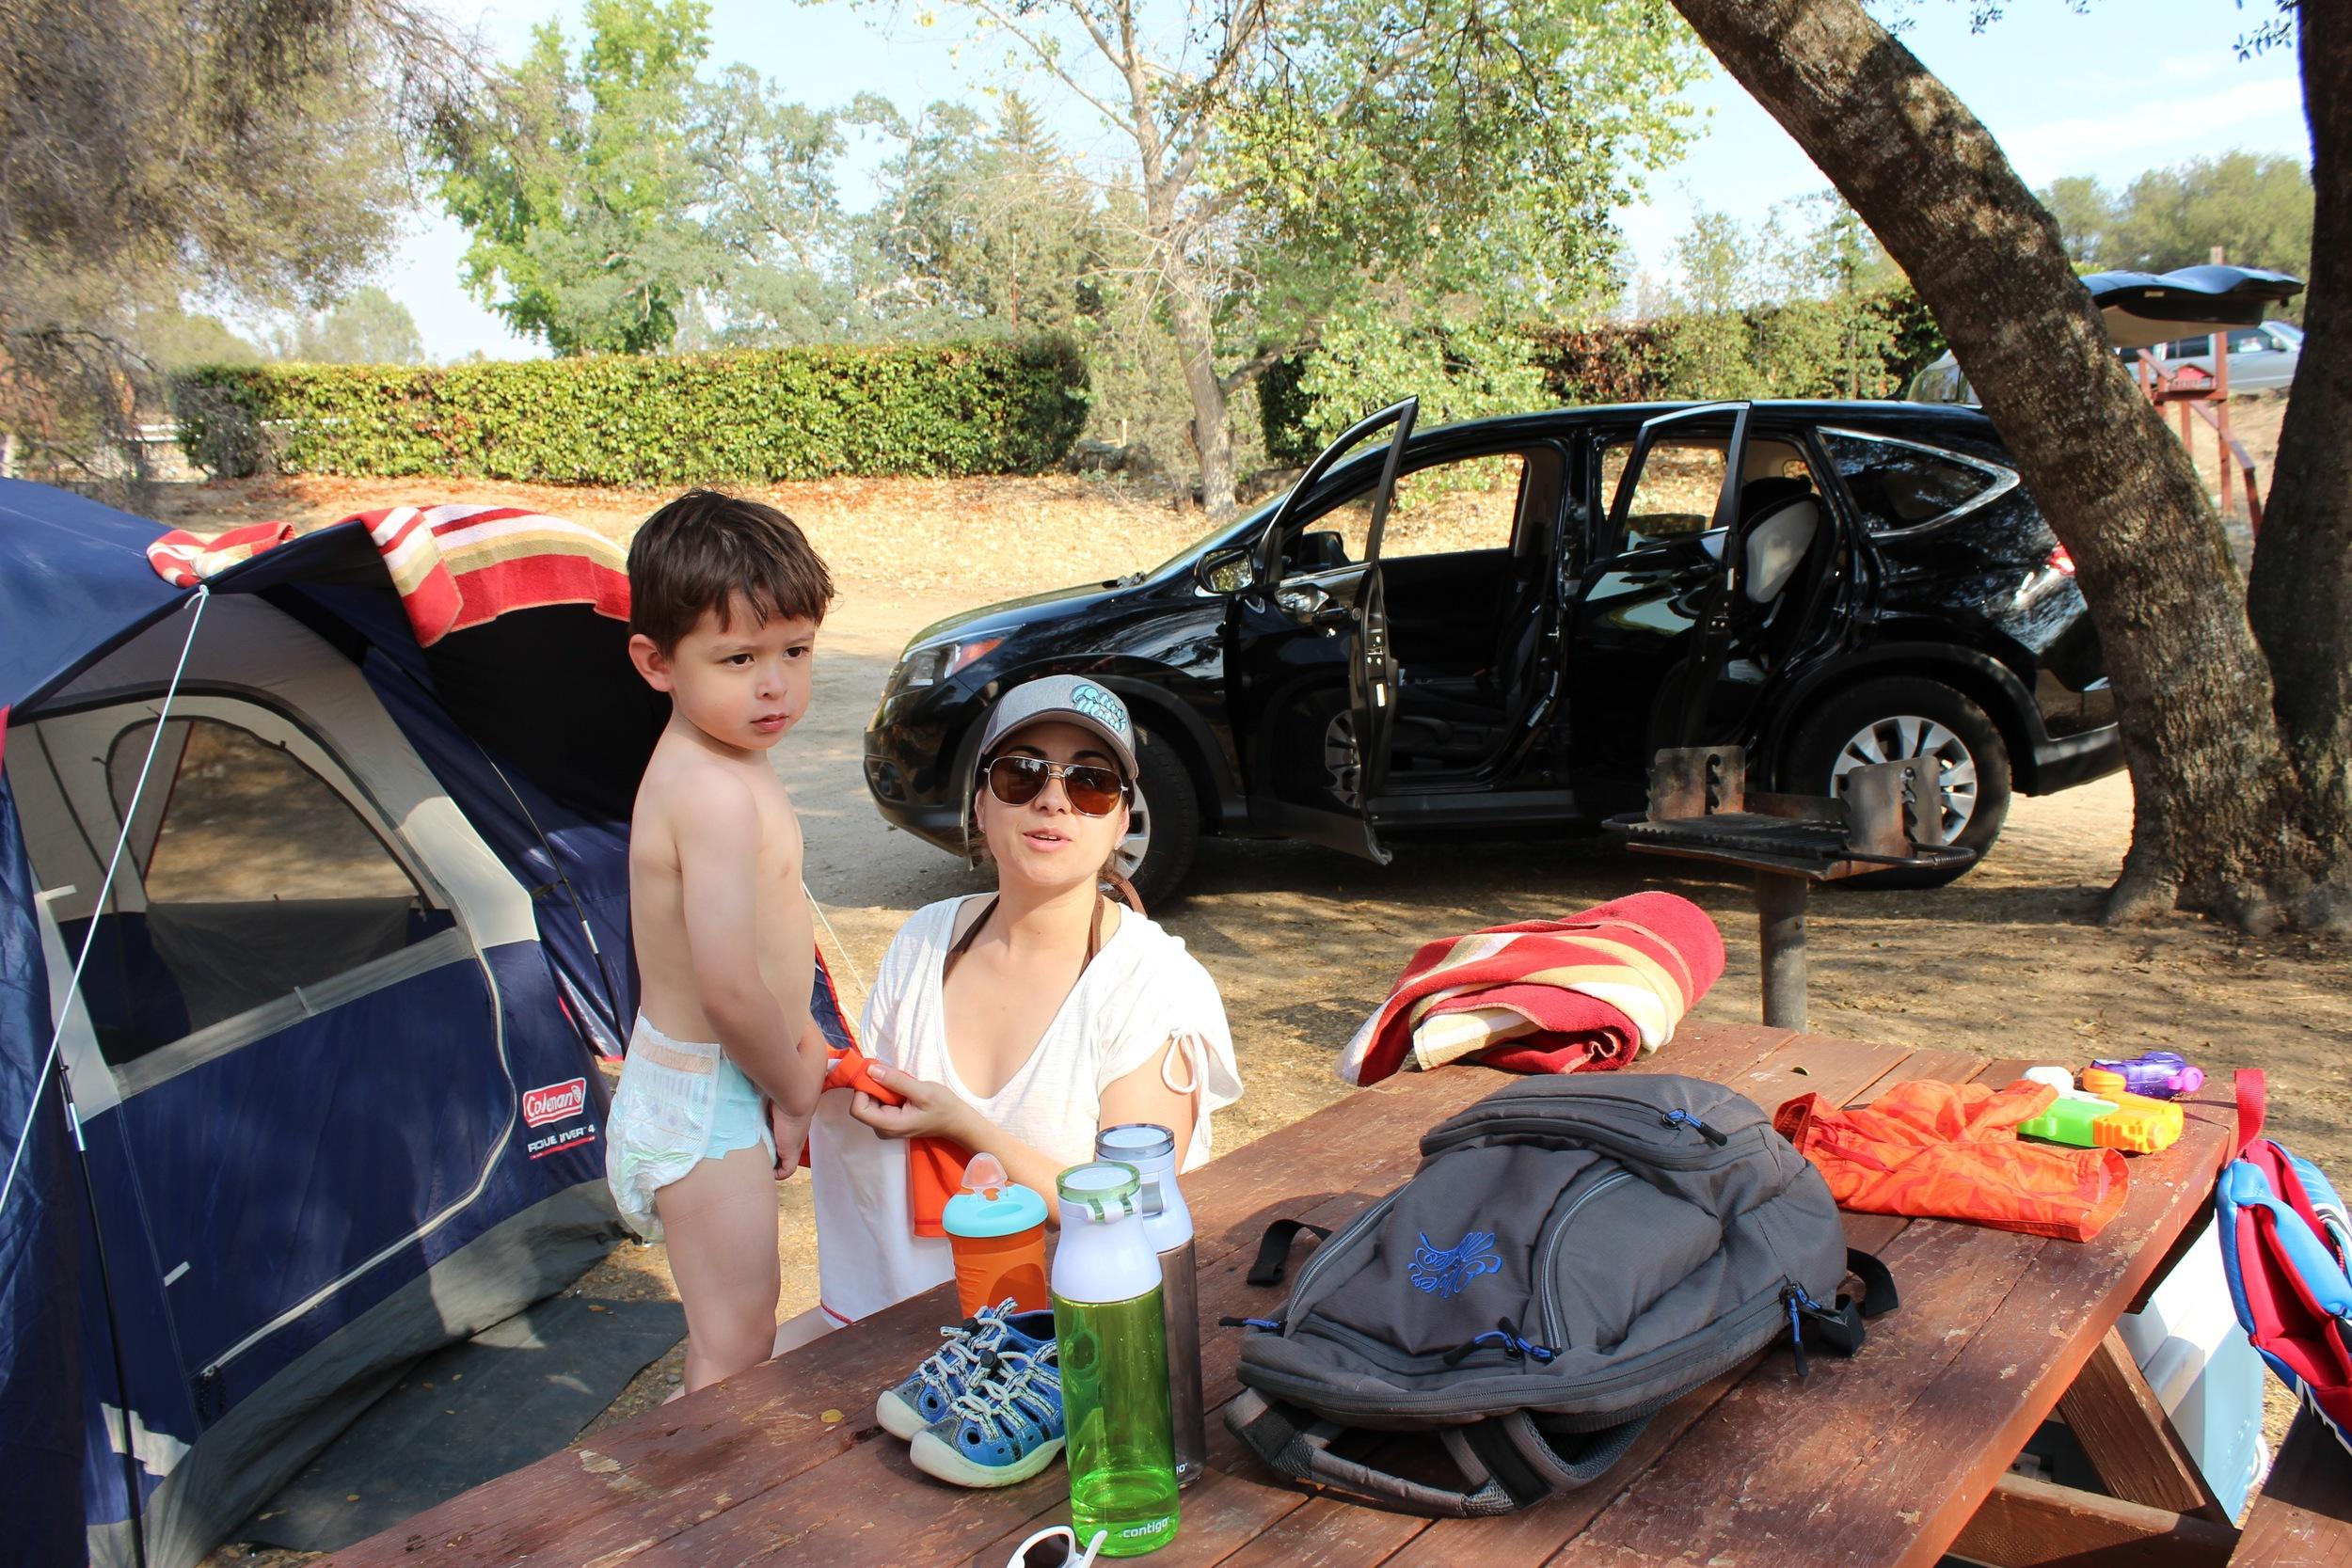 Coarsegold_Ca_KOA_Camping August_201543 (1).jpg